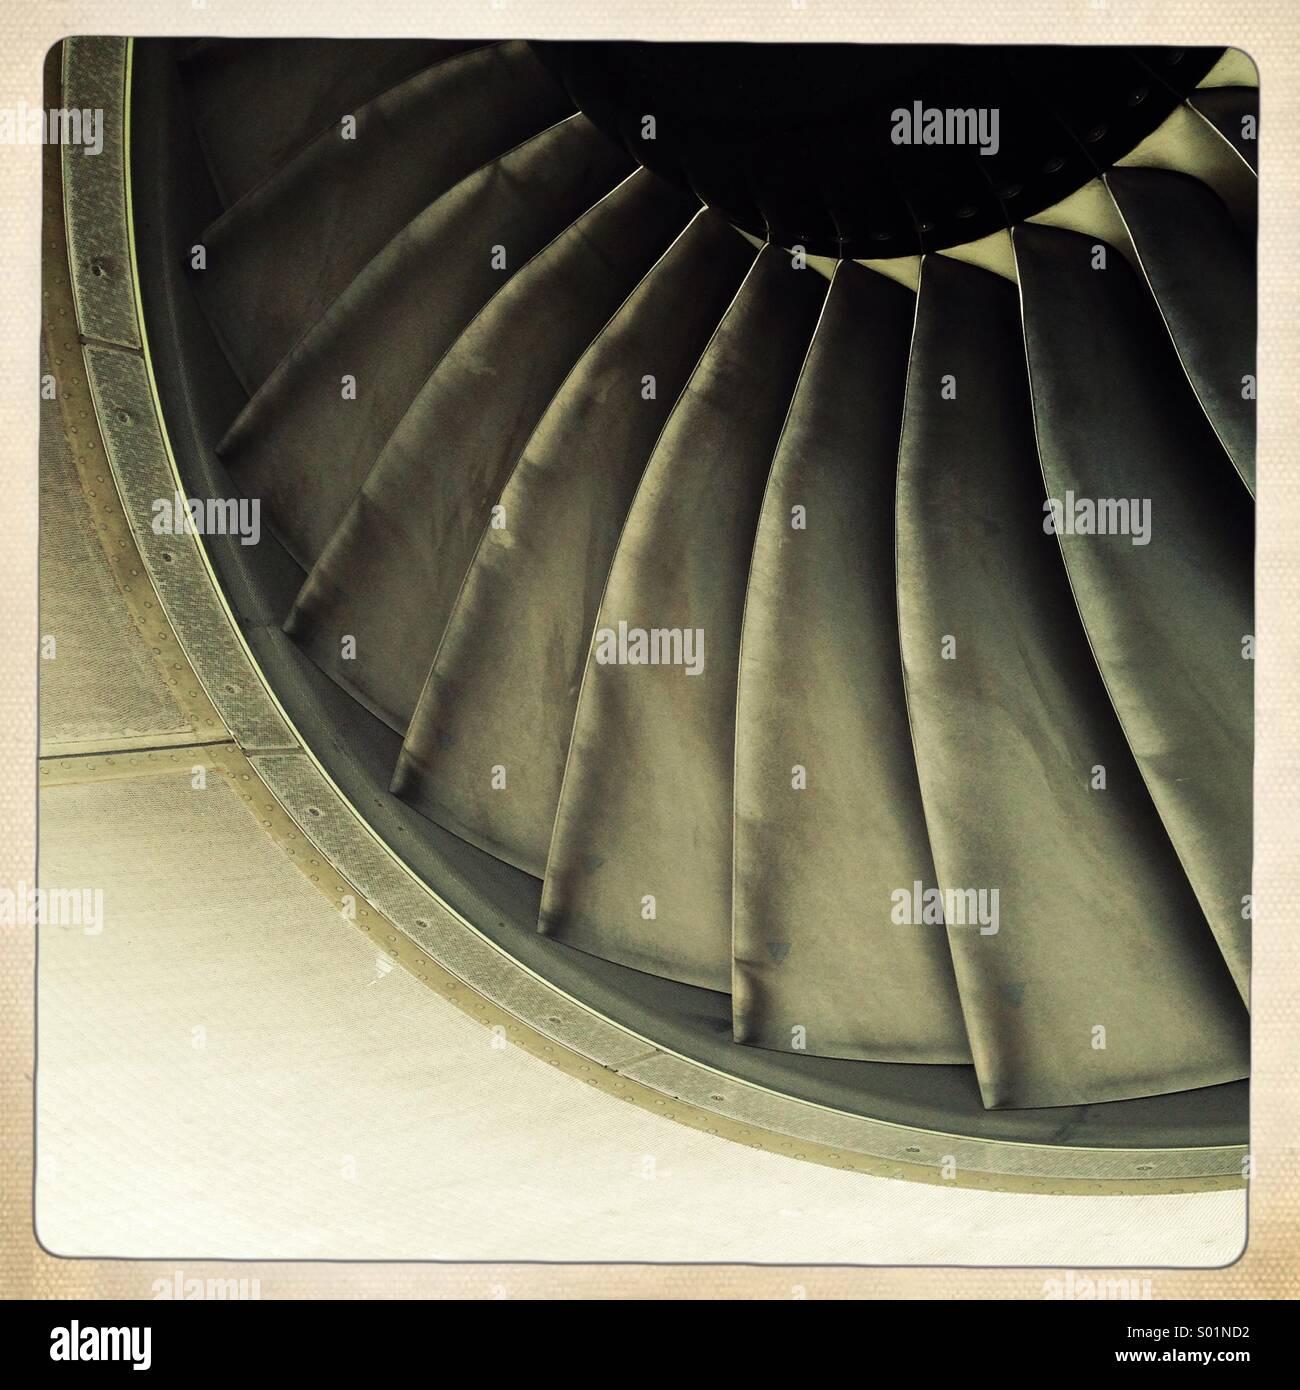 Aircraft engine blades - Stock Image